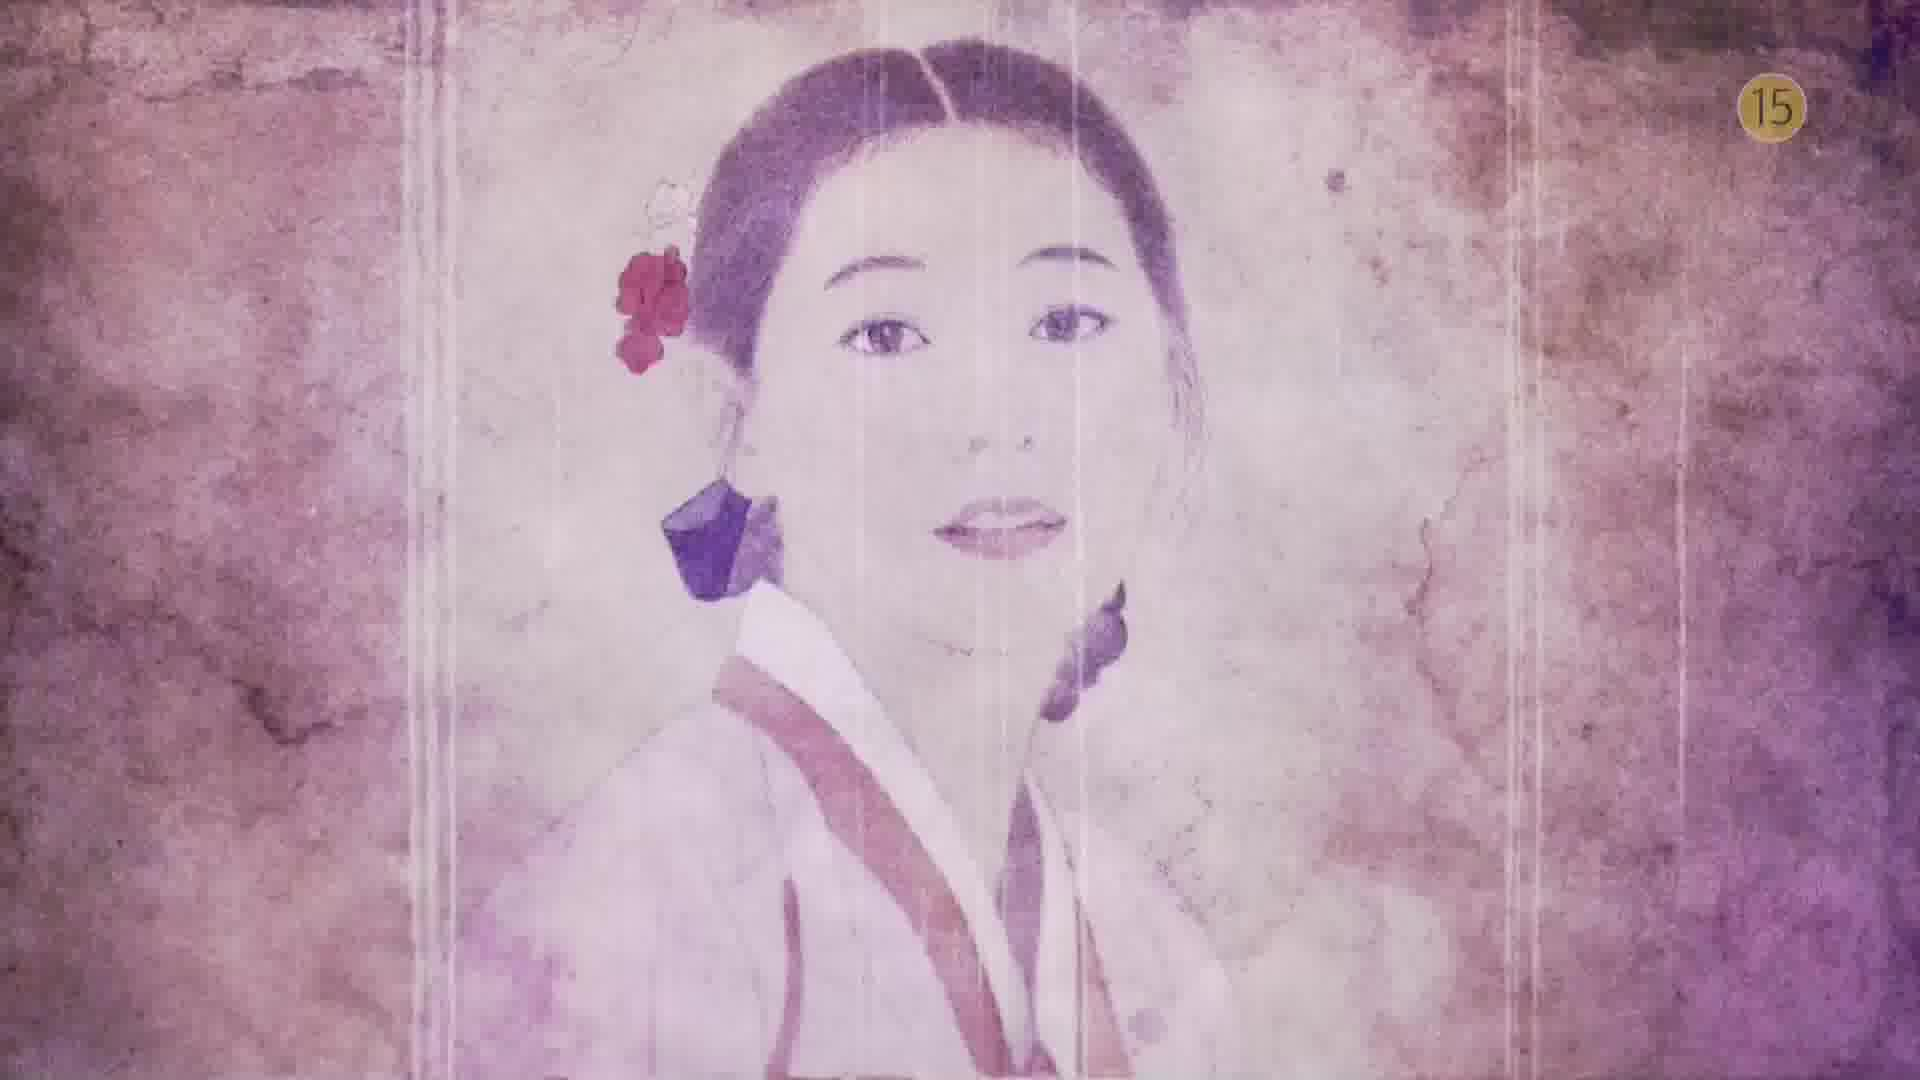 Trailer: Saimdang, Light's Diary